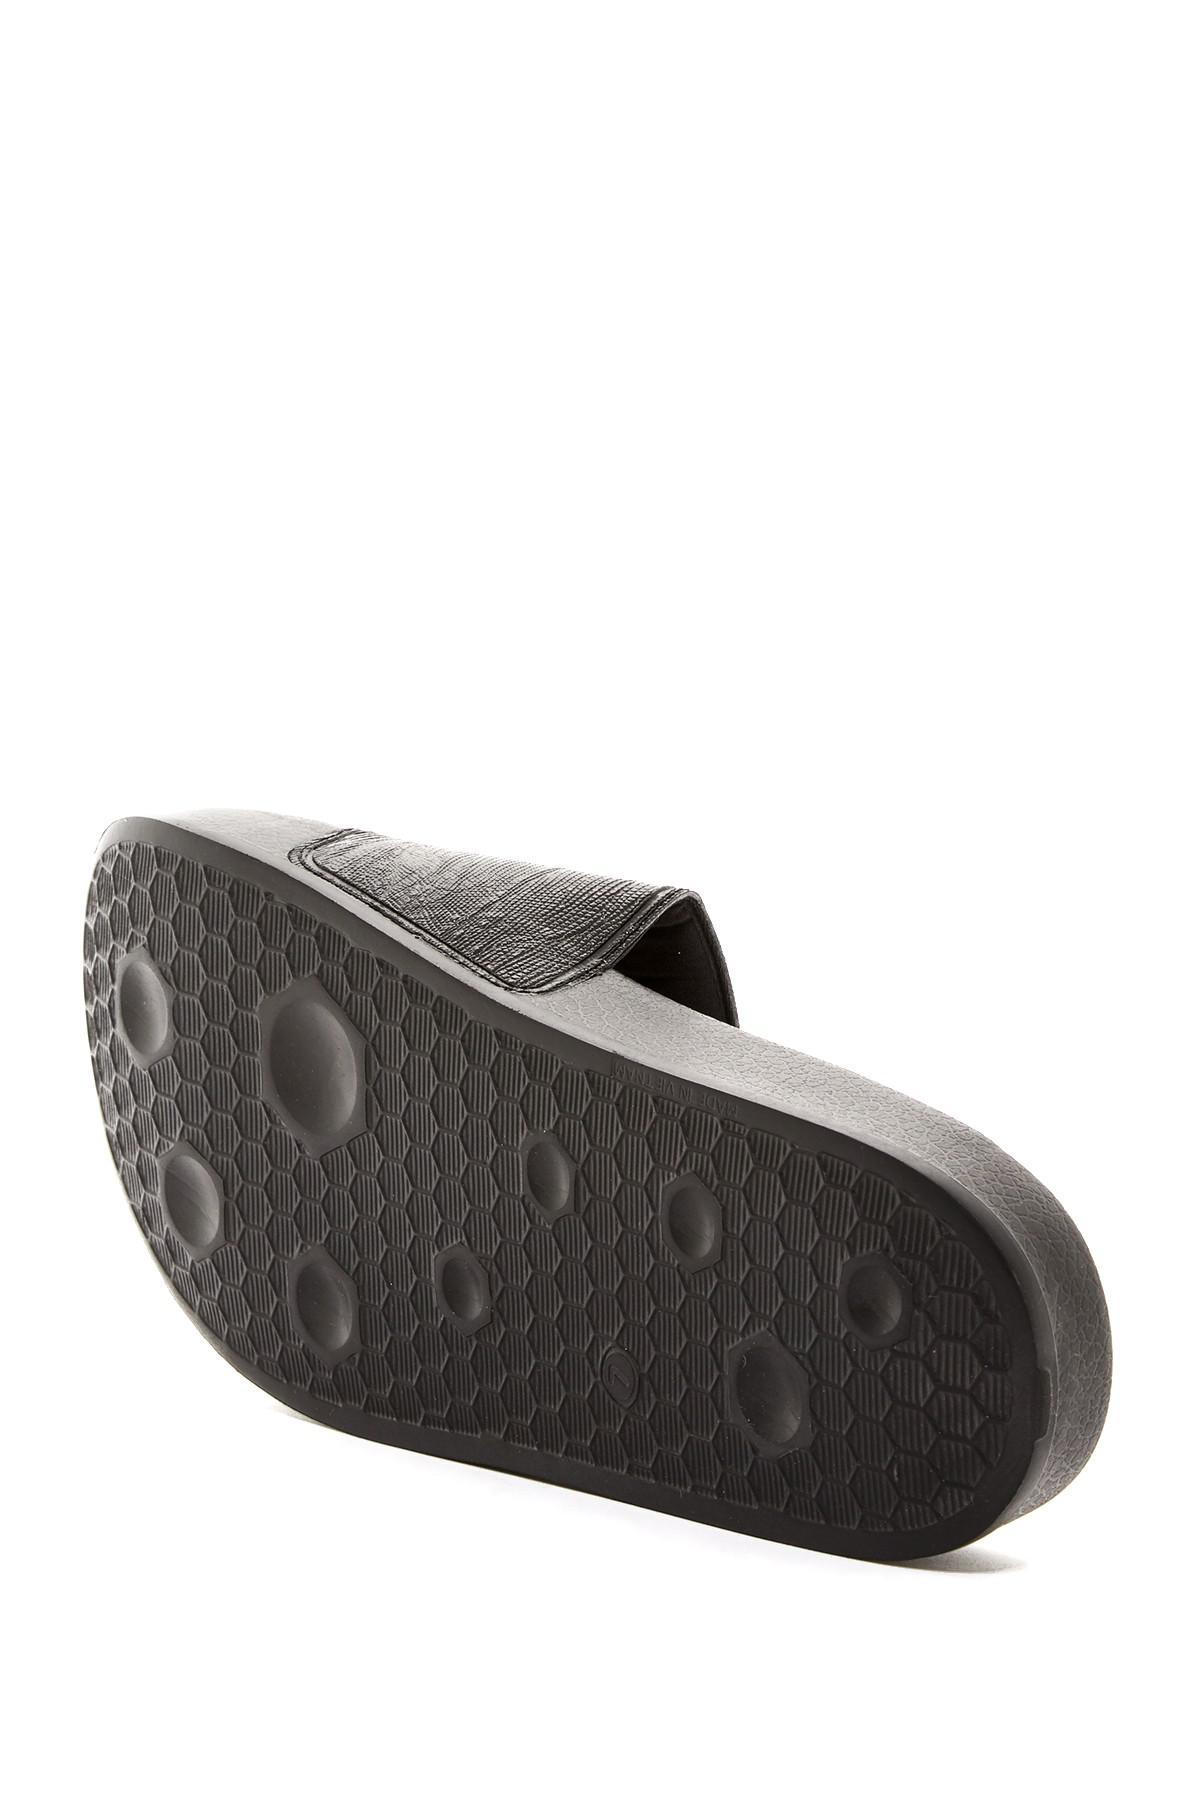 4352ceb6506b4b PUMA - Black Leadcat Embossed Slide Sandal - Lyst. View fullscreen